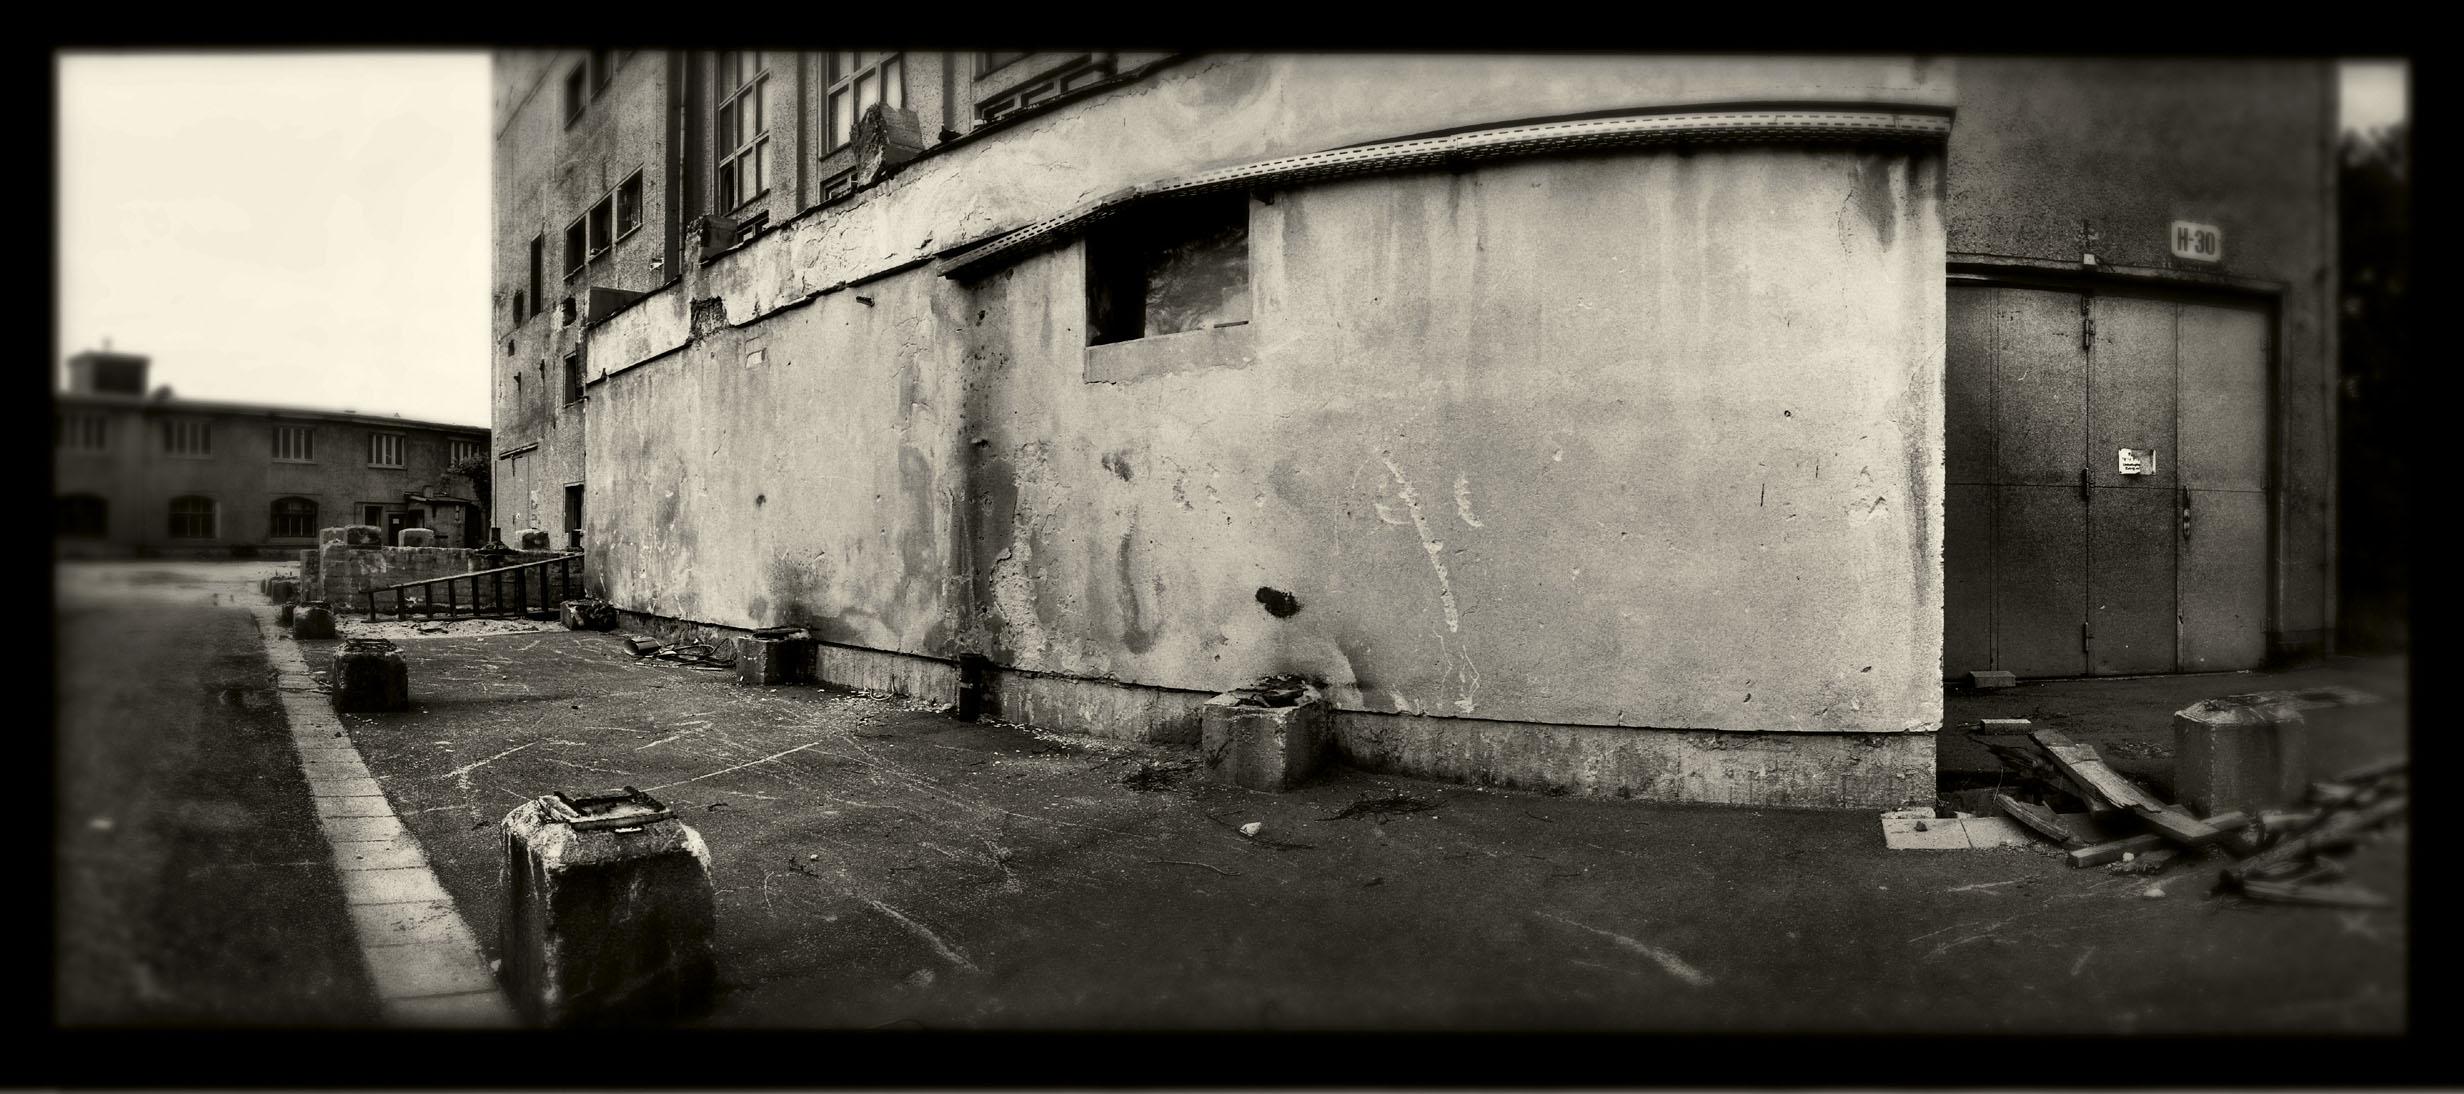 Abandoned space photo